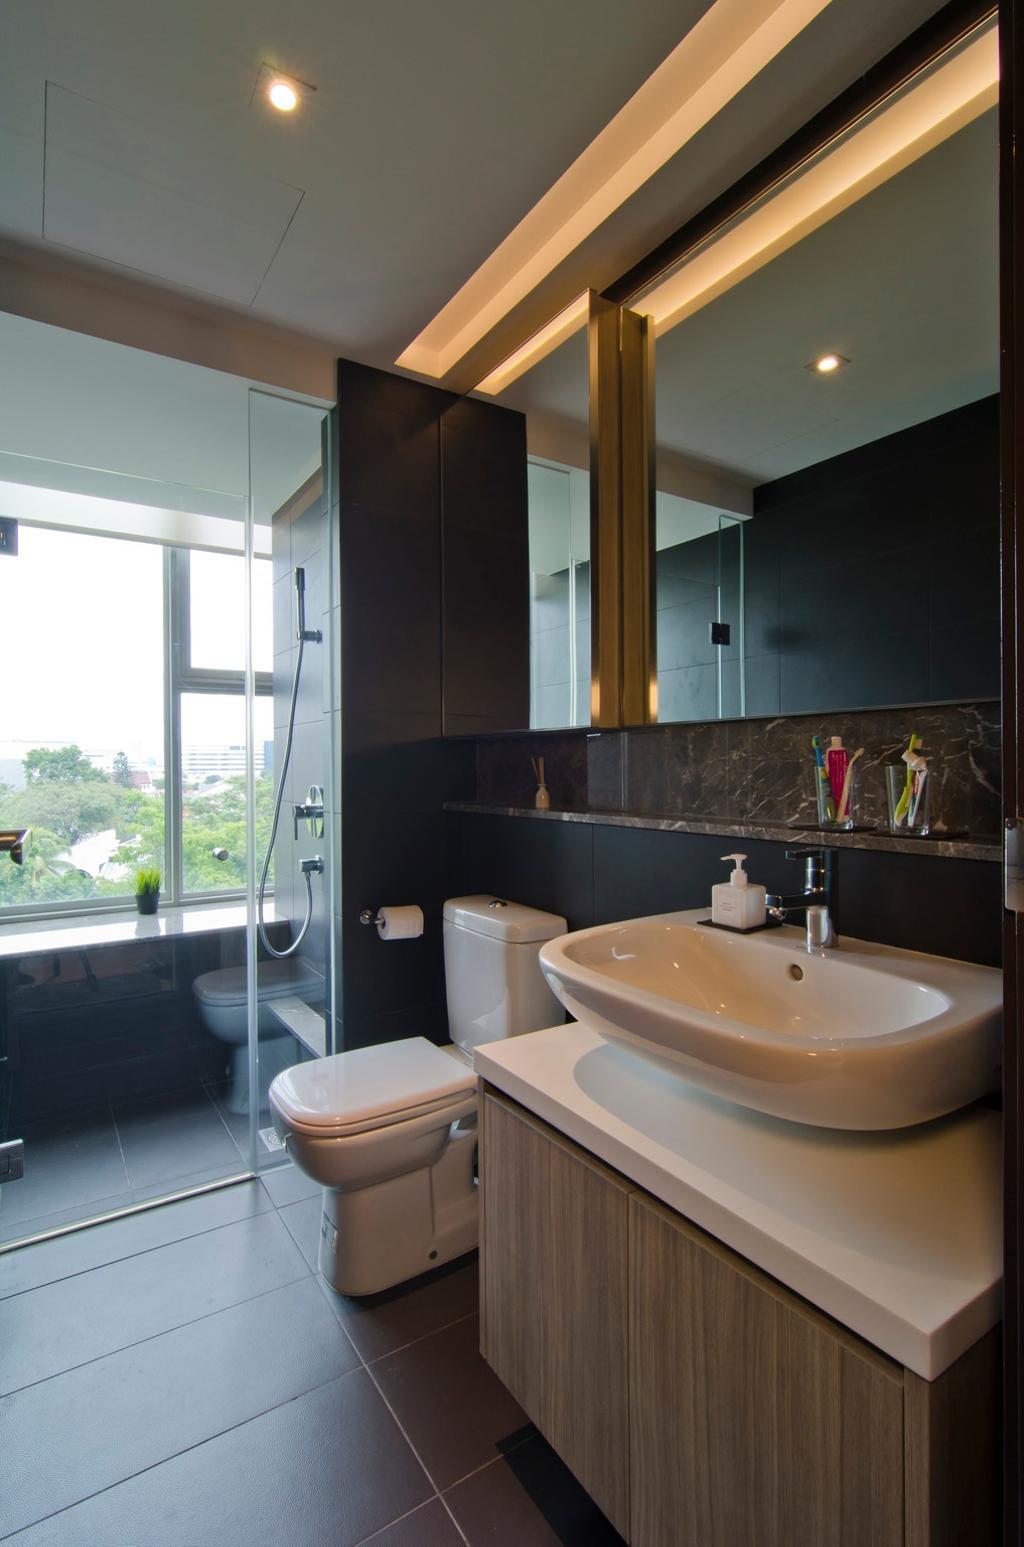 Modern, Condo, Bathroom, Tanah Merah Kecil, Interior Designer, Ideal Design Interior, Glass Cubicle, Window Seat, Mirror, Vessel Sink, Bathroom Counter, Wood Laminate, Wood, Laminate, Tile, Tiles, Shelf, Shelves, Concealed Lighting, Marble Wall